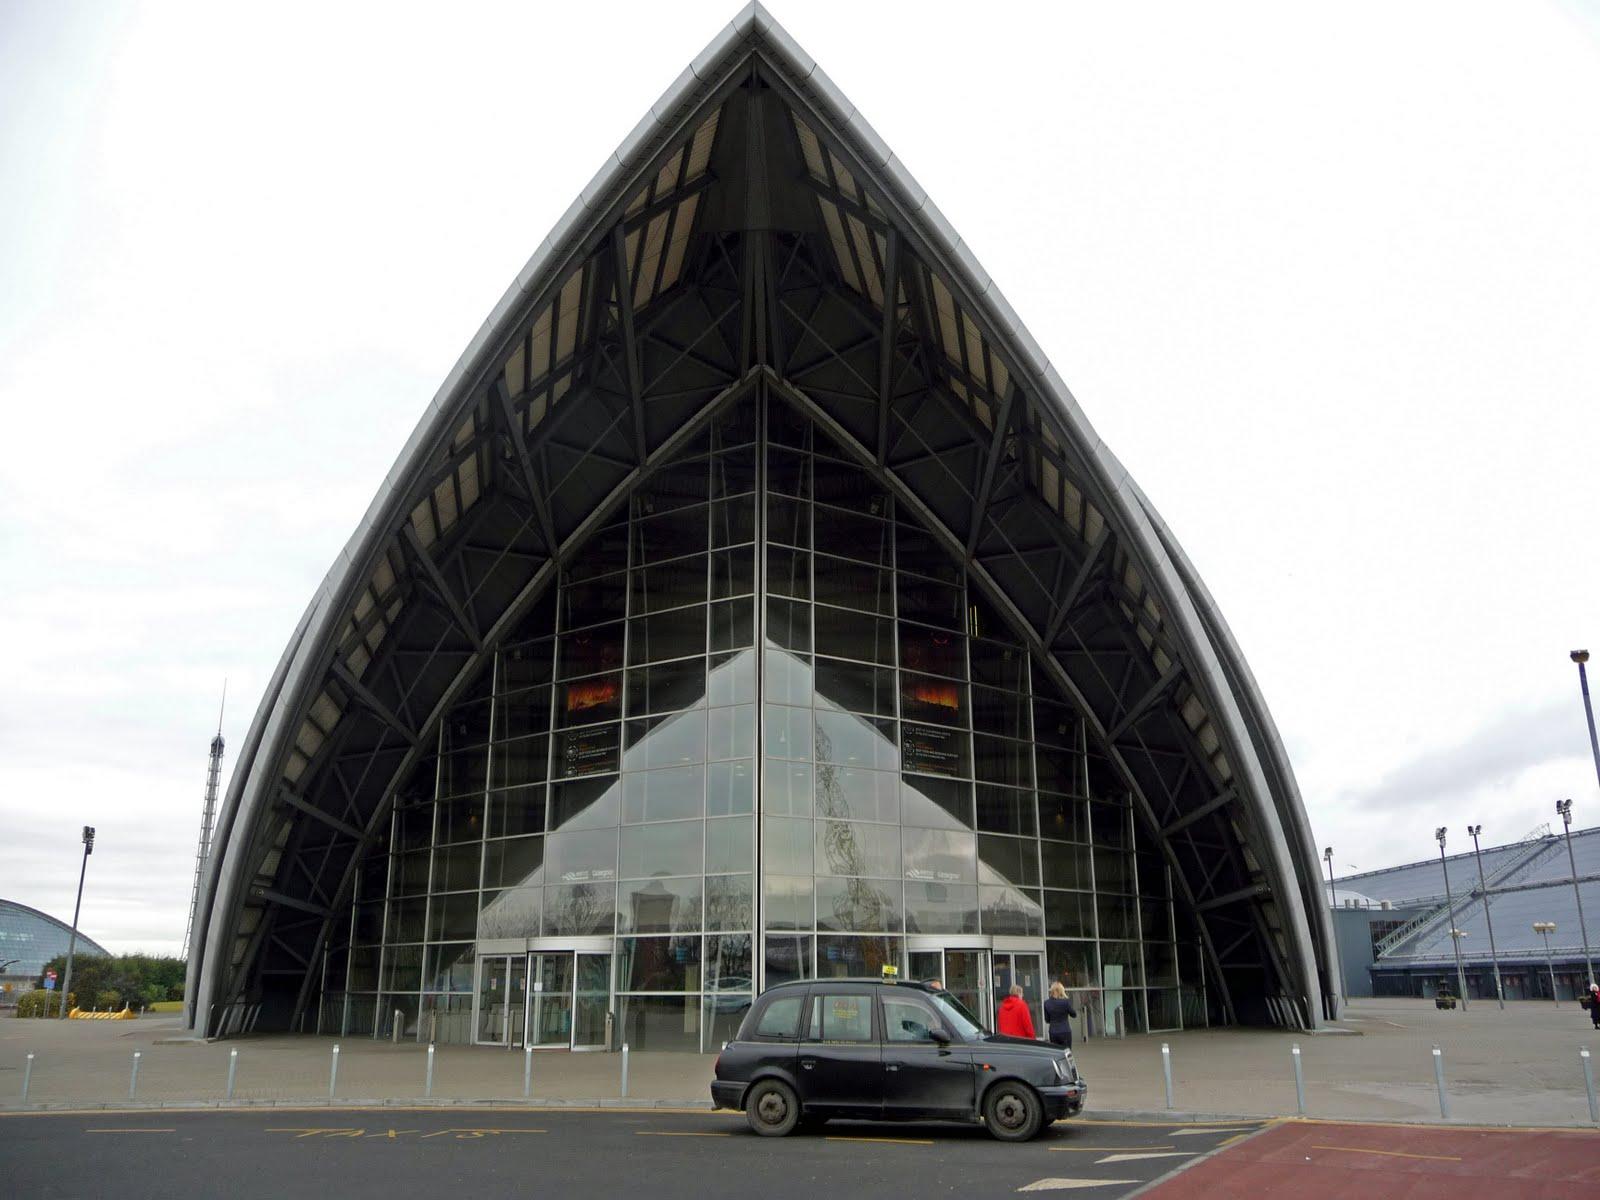 Glasgow Architecture Armadillo Scottish Tour Guide 39 S Blog